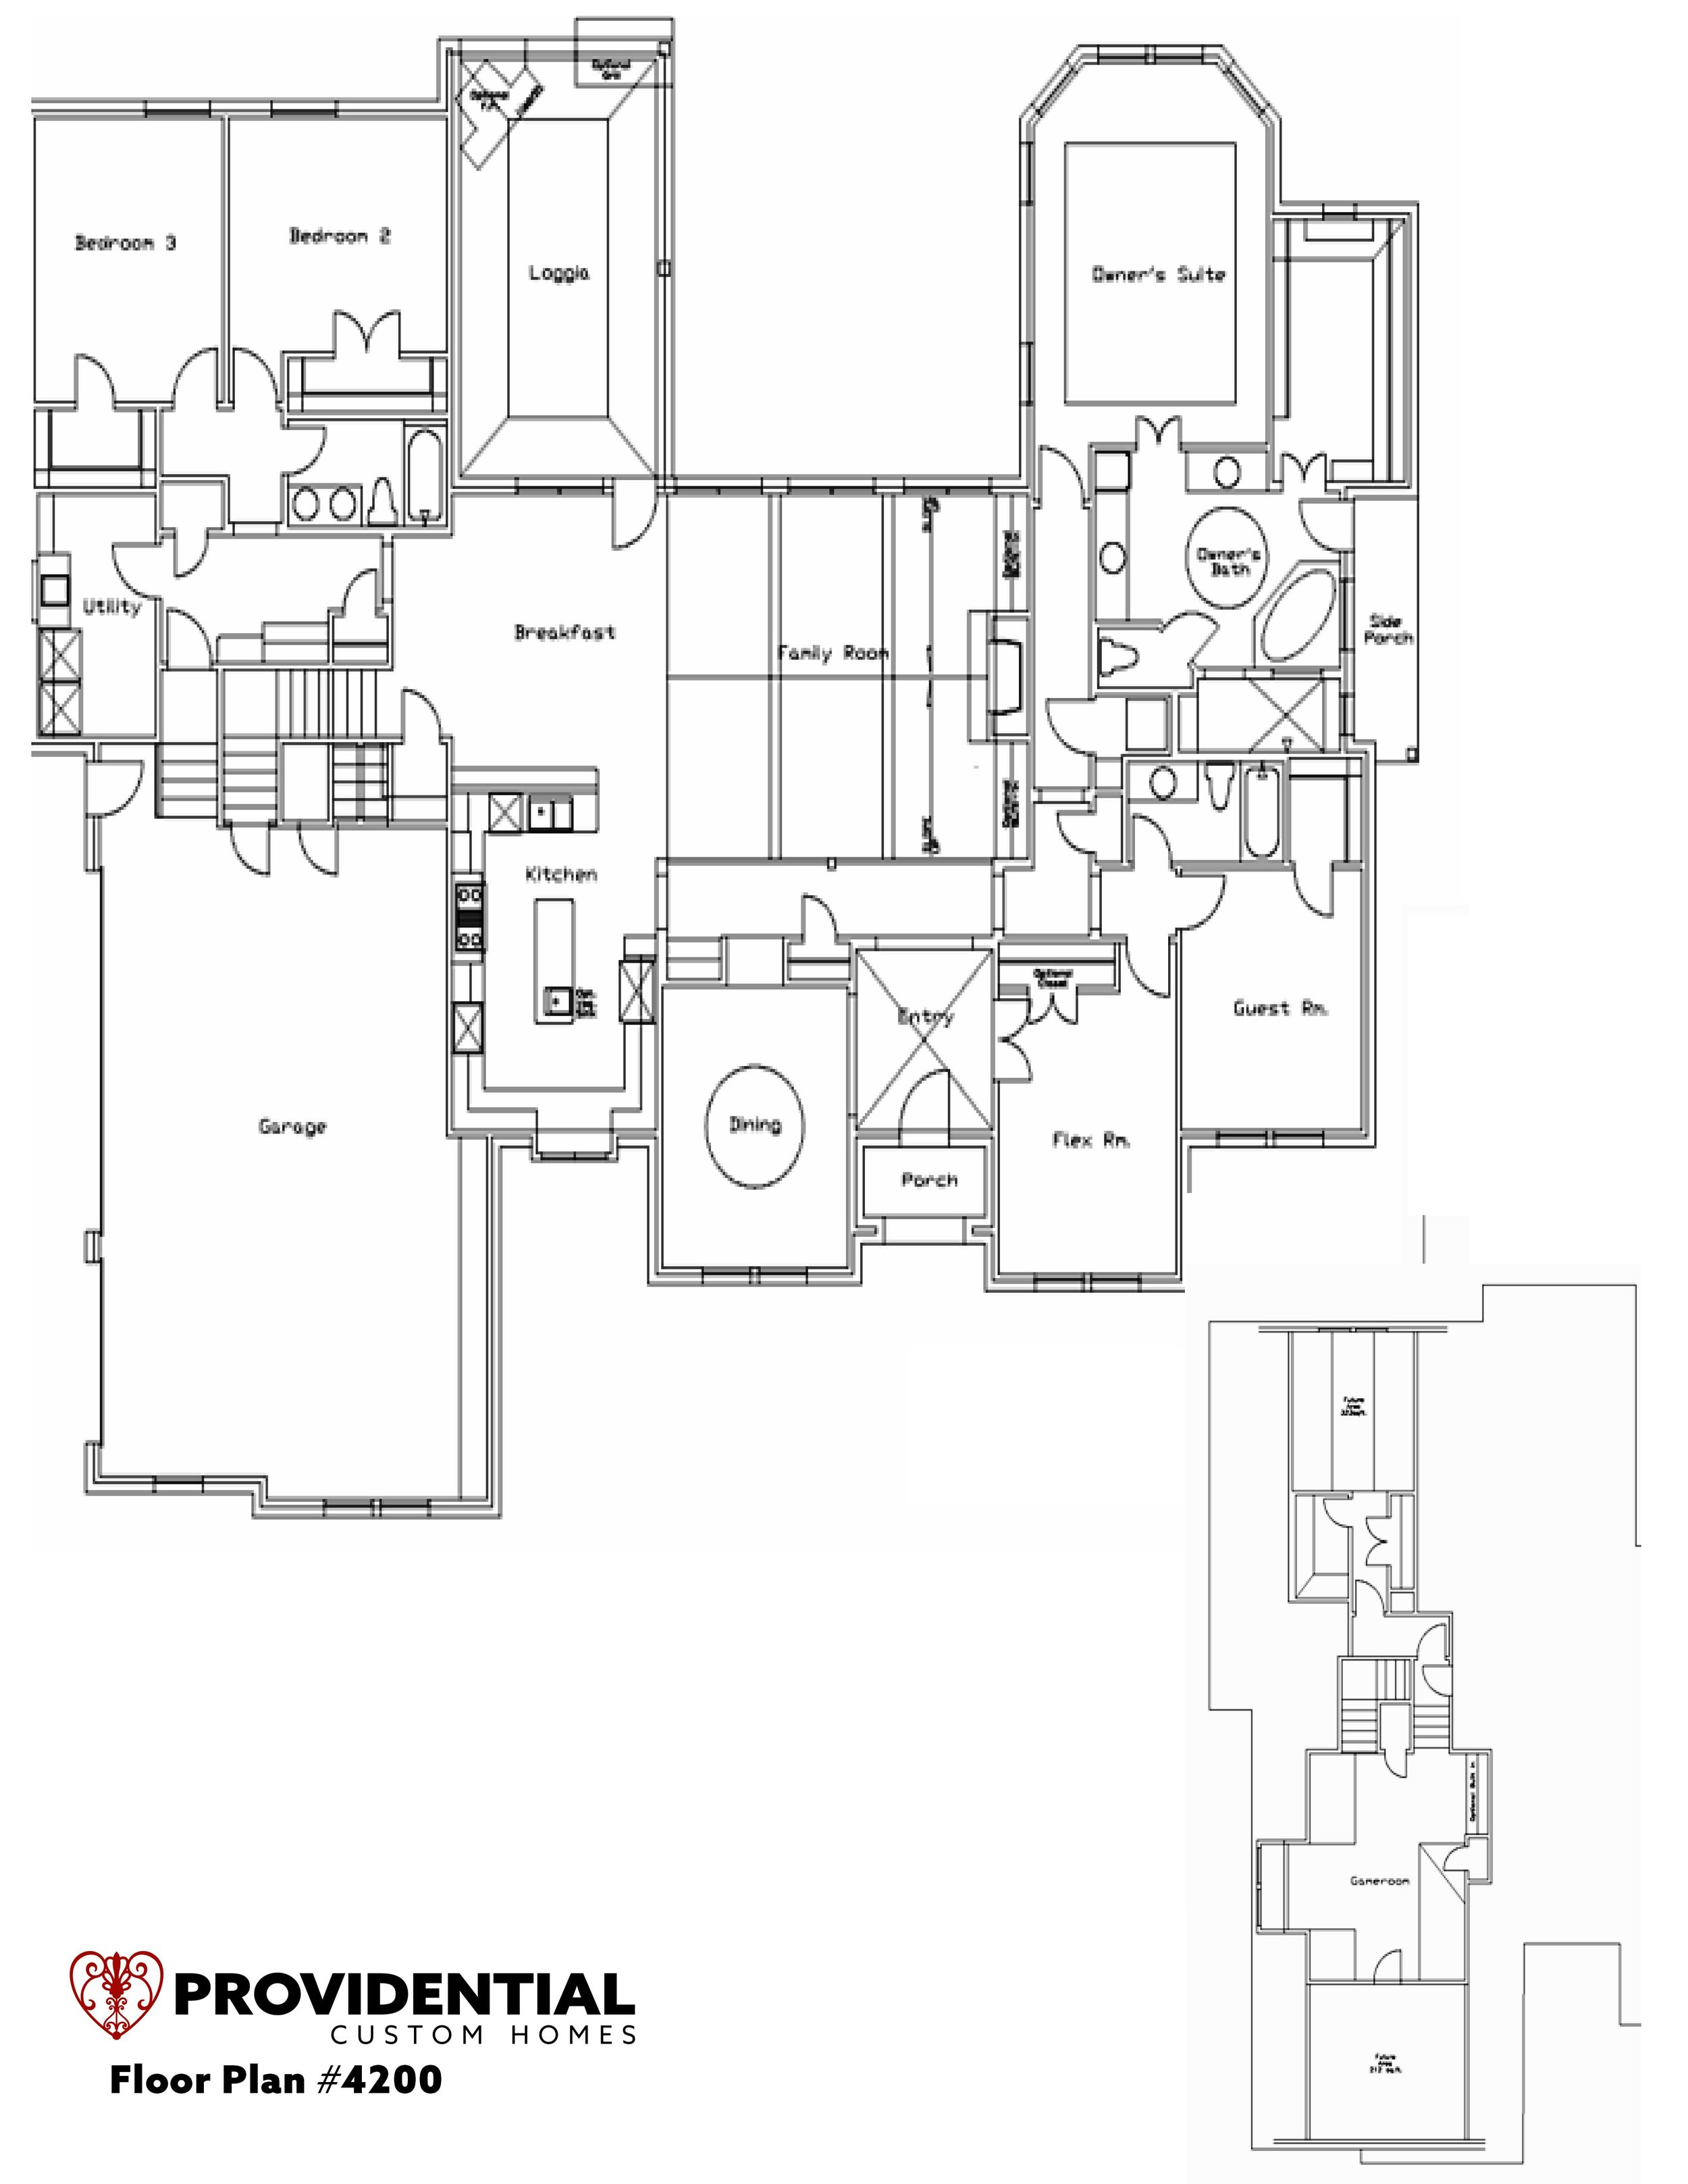 The FLOOR PLAN 4200.jpg